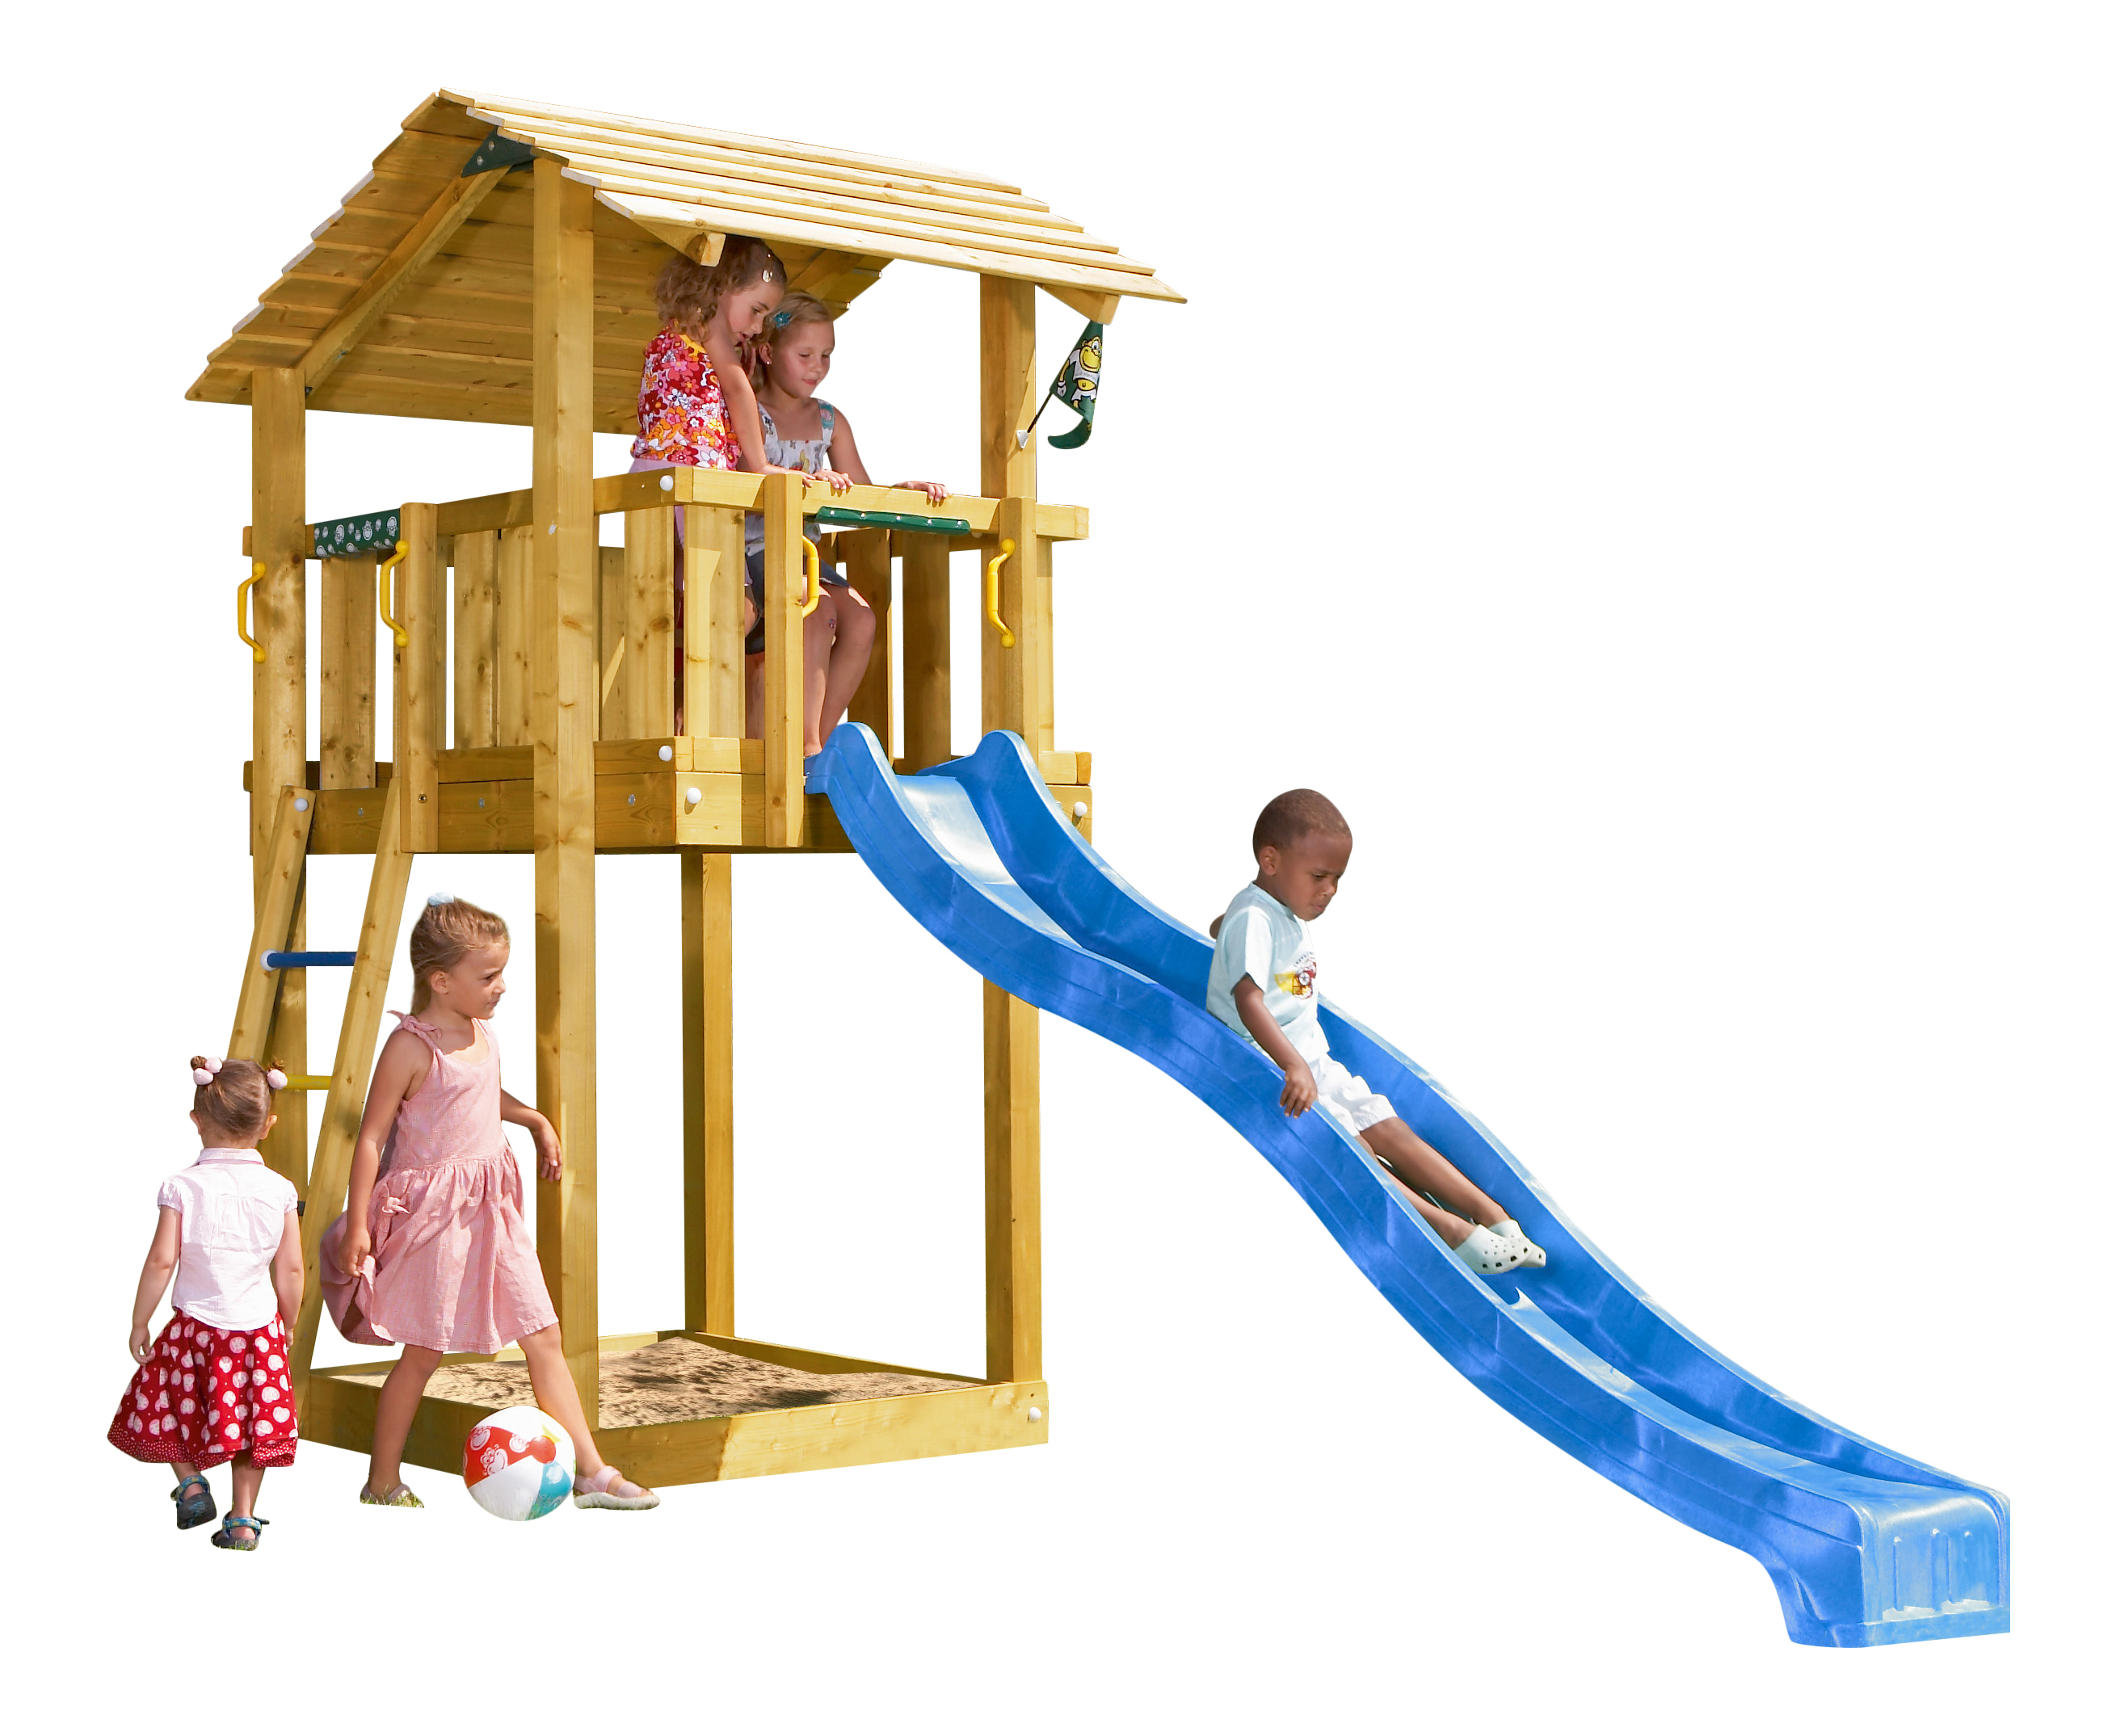 jungle gym spielturm shelter kletterturm mit rutsche holz spielhaus ebay. Black Bedroom Furniture Sets. Home Design Ideas